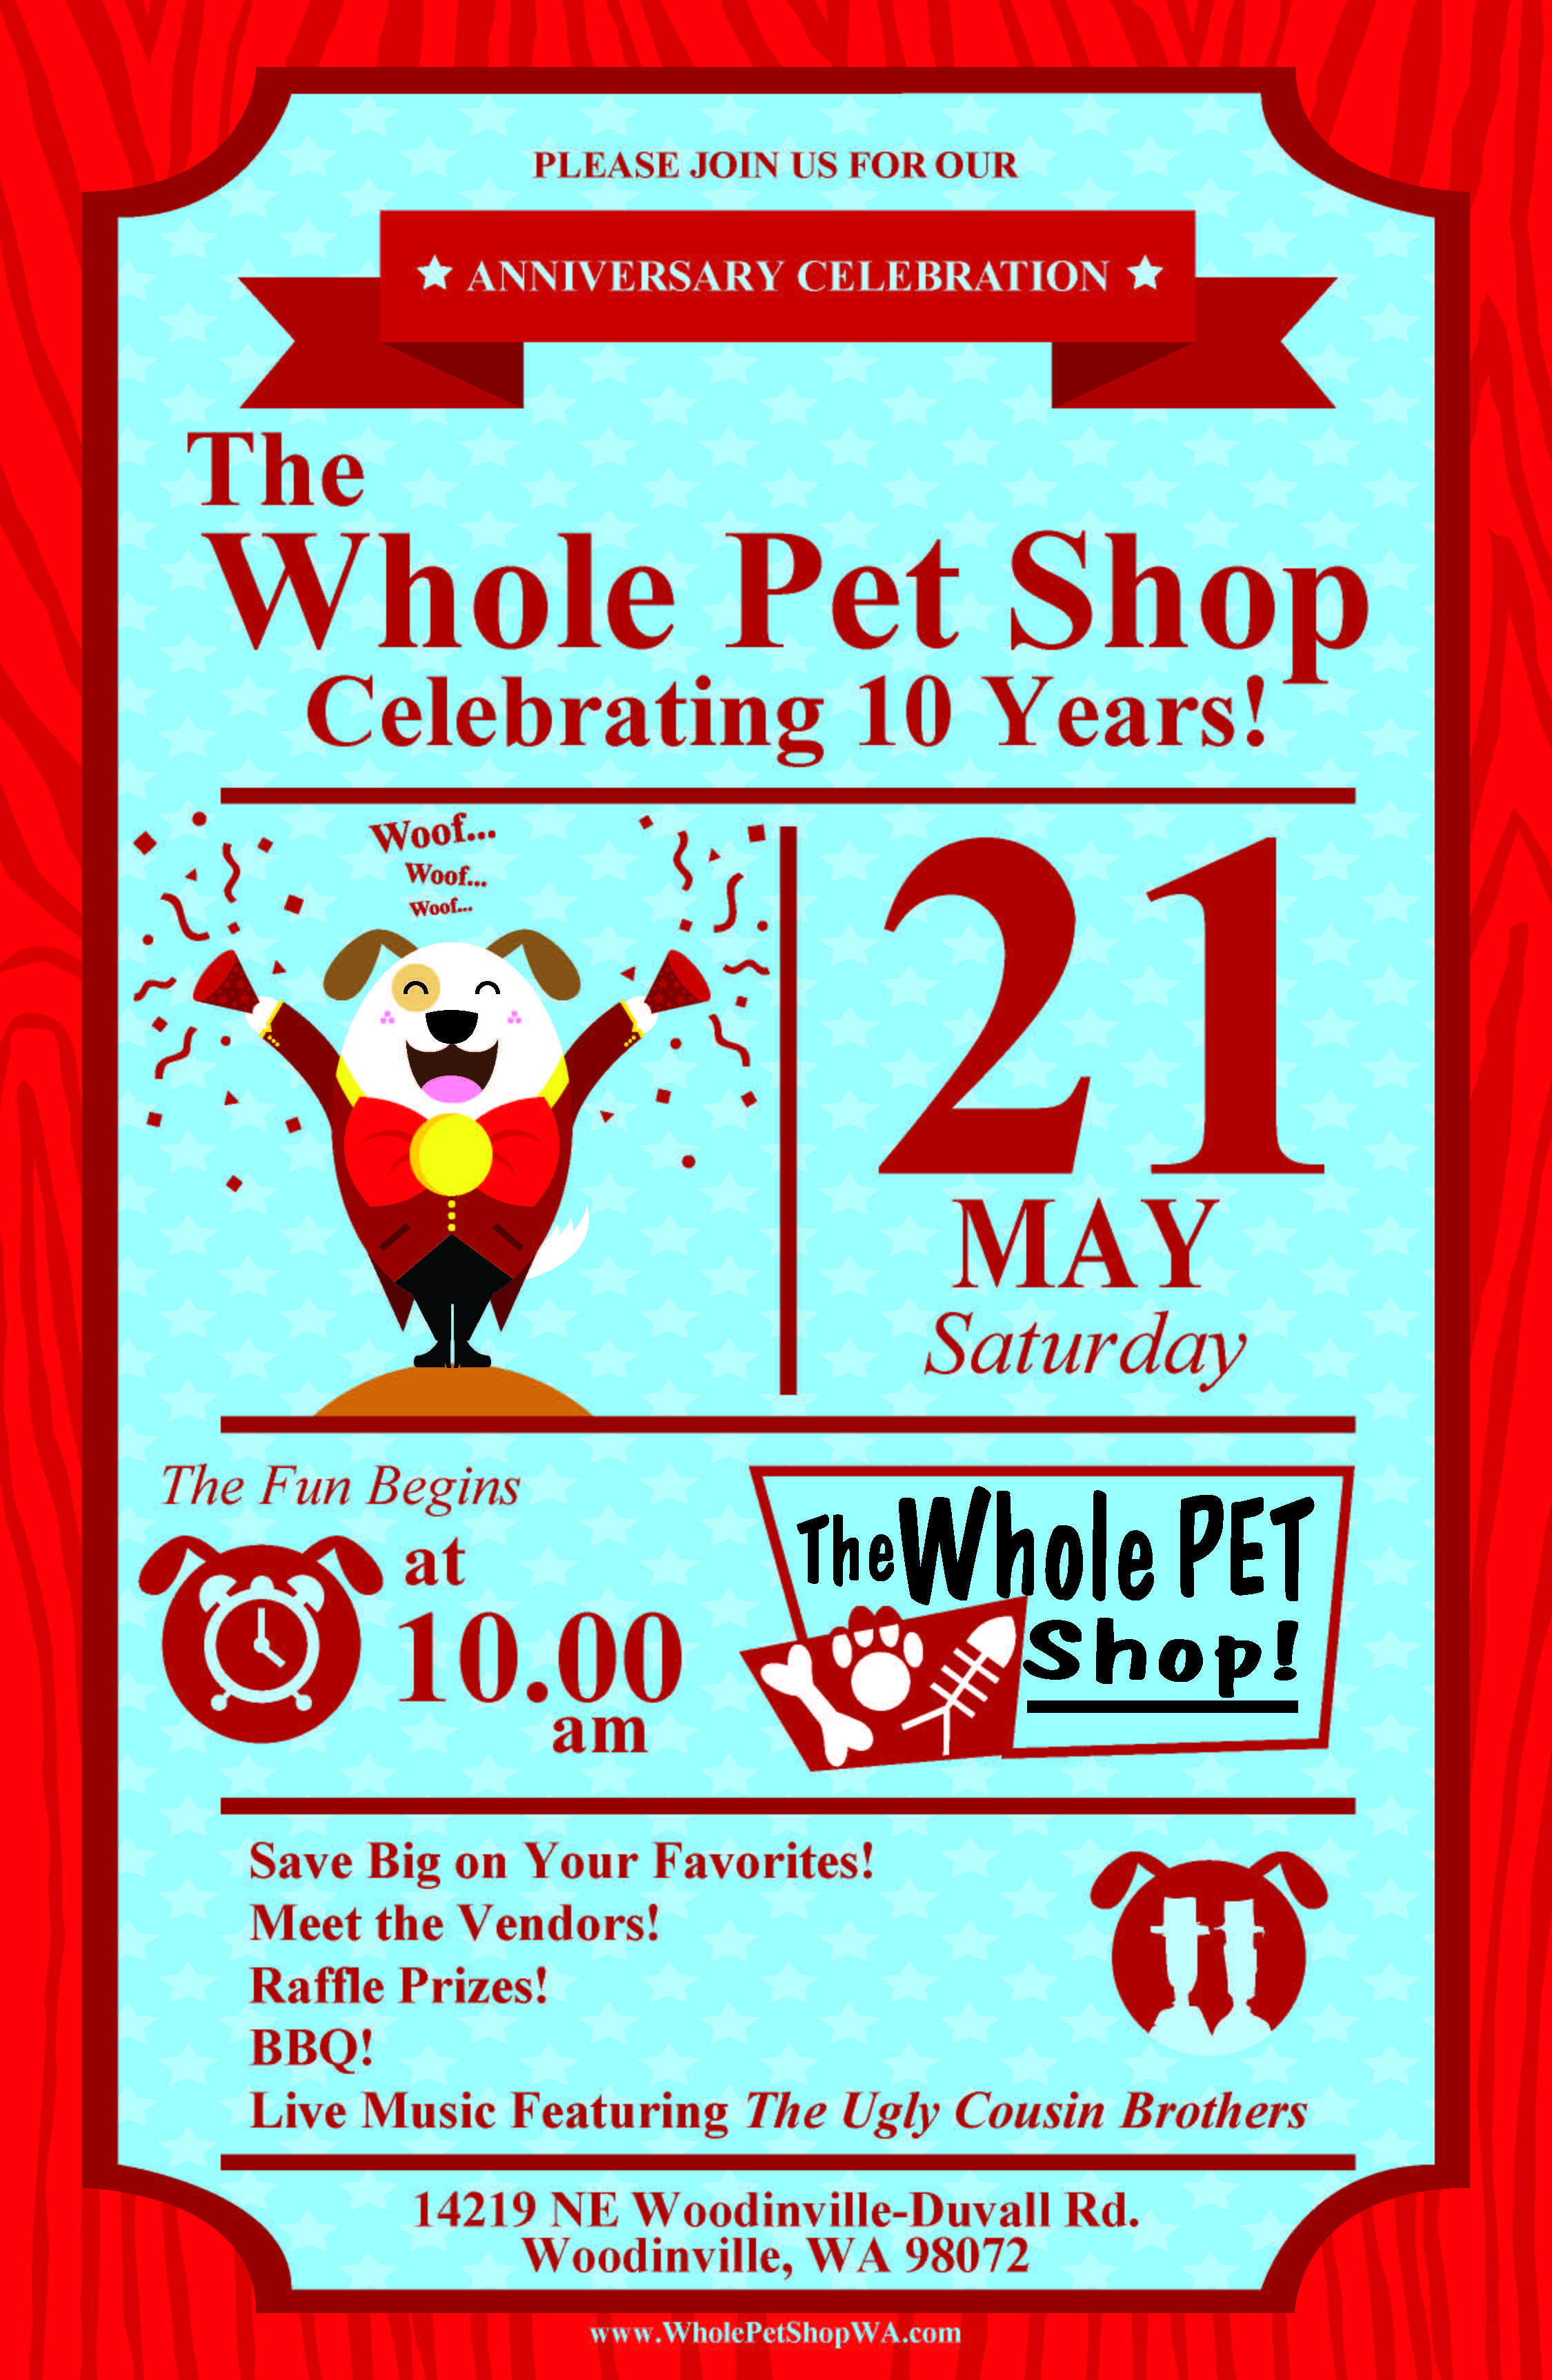 TWPS 10 yr Anniversary Event_Page_1.jpg